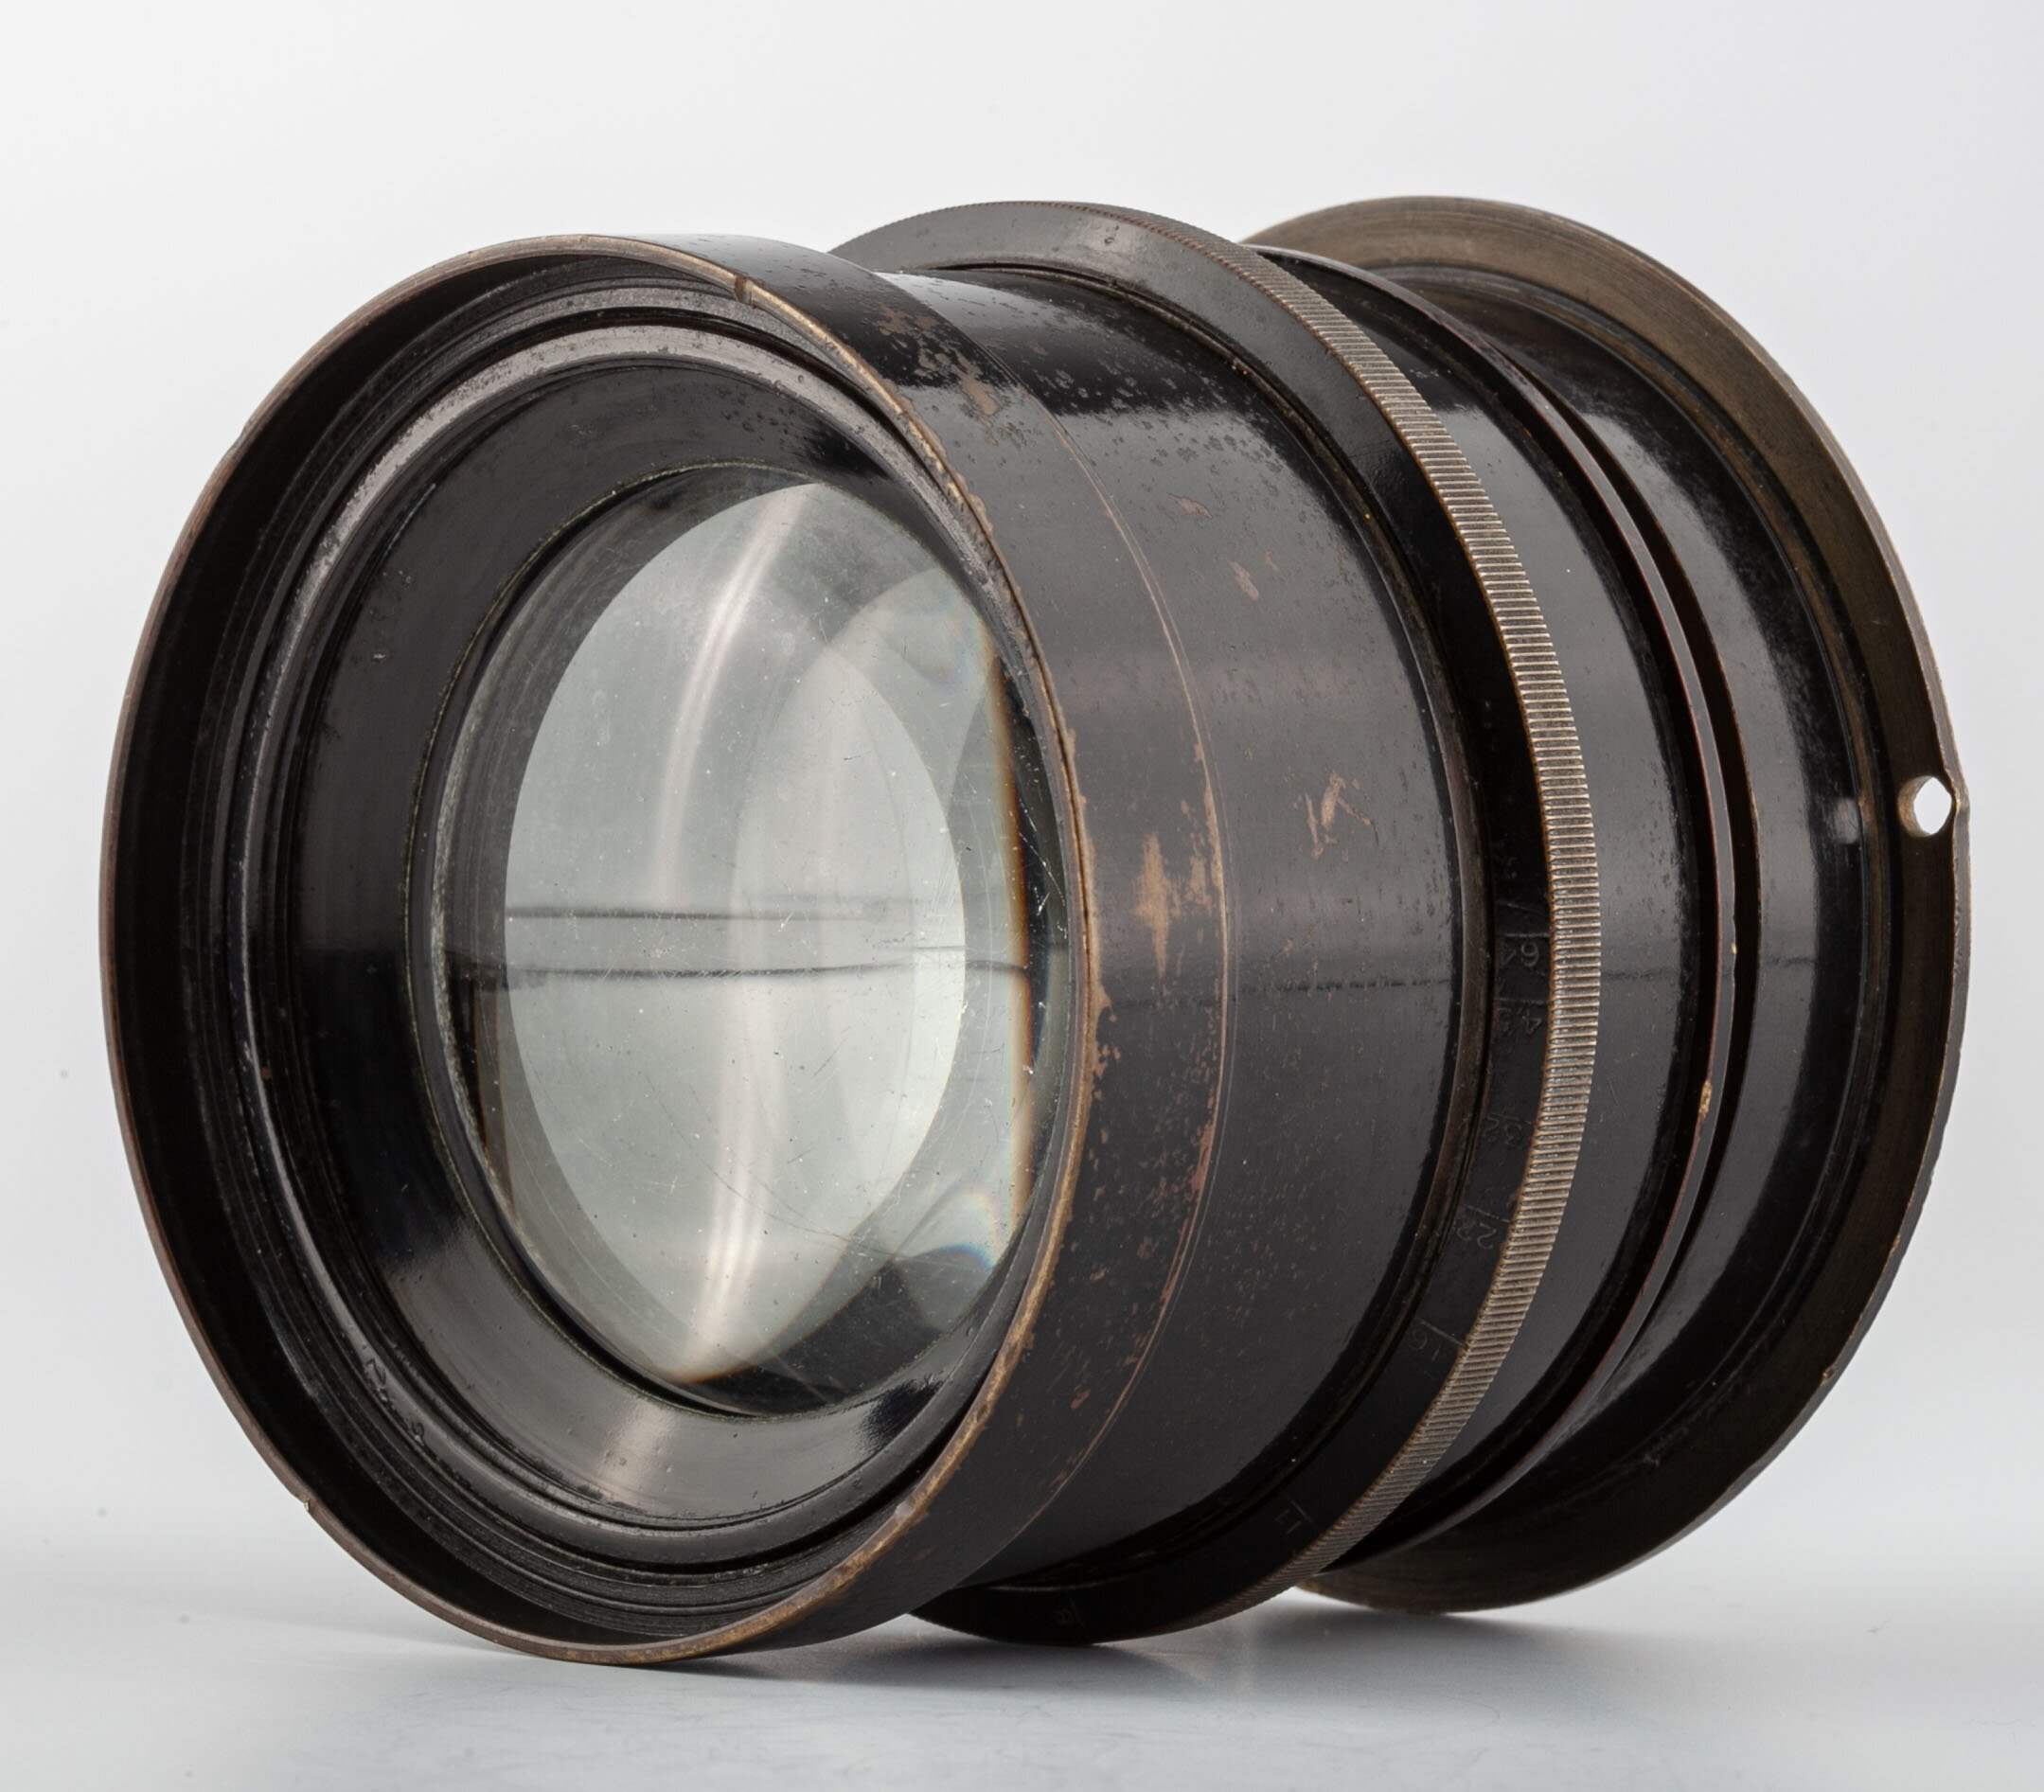 Hermagis Paris Serie TPH 460mm No.5